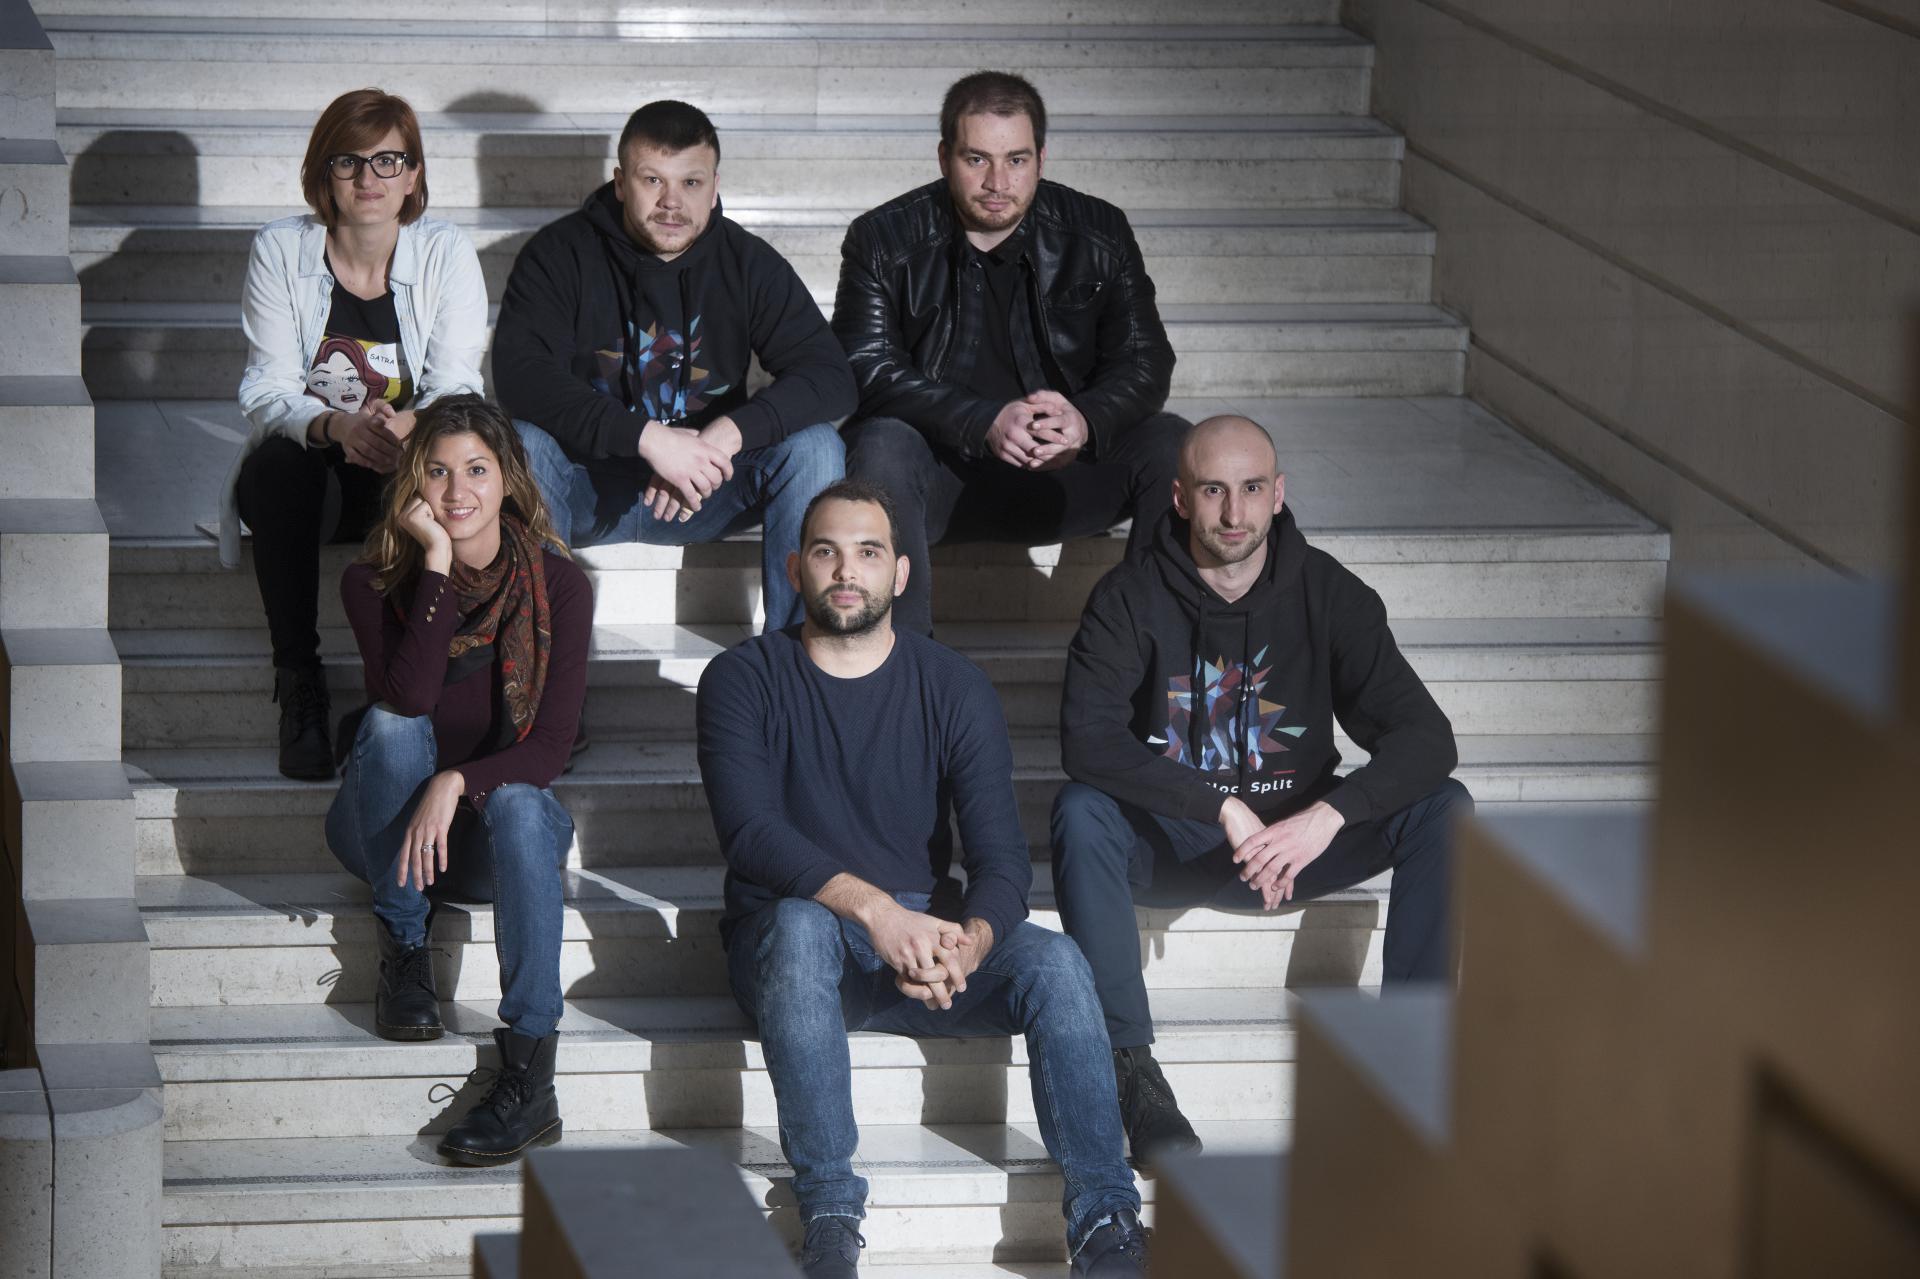 Na slici slijeva gore: Maja Giljanović,Antonio Perić-Mažar, Matko Đipalo, dolje Petra Leskovac Dujišin Tomislav Mamić